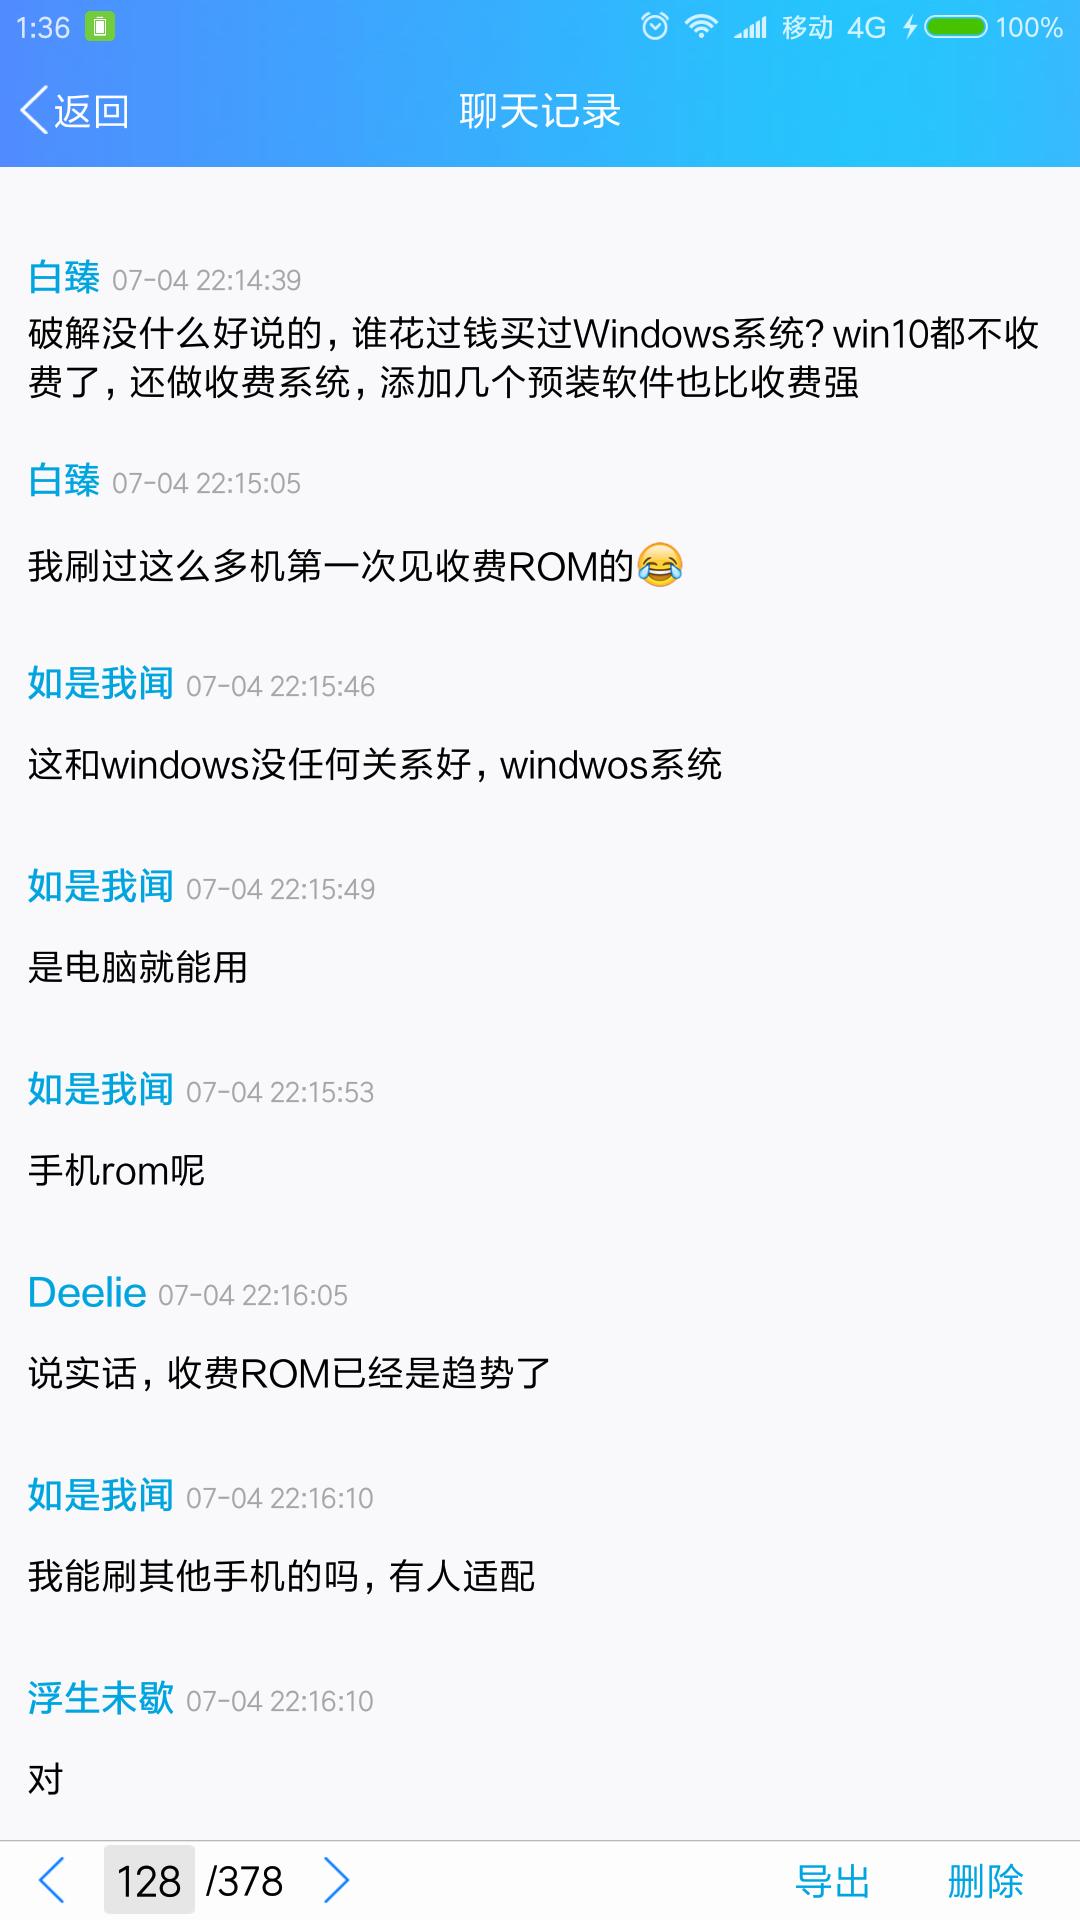 Screenshot_2017-07-09-01-36-26-761_com.tencent.mobileqq.png